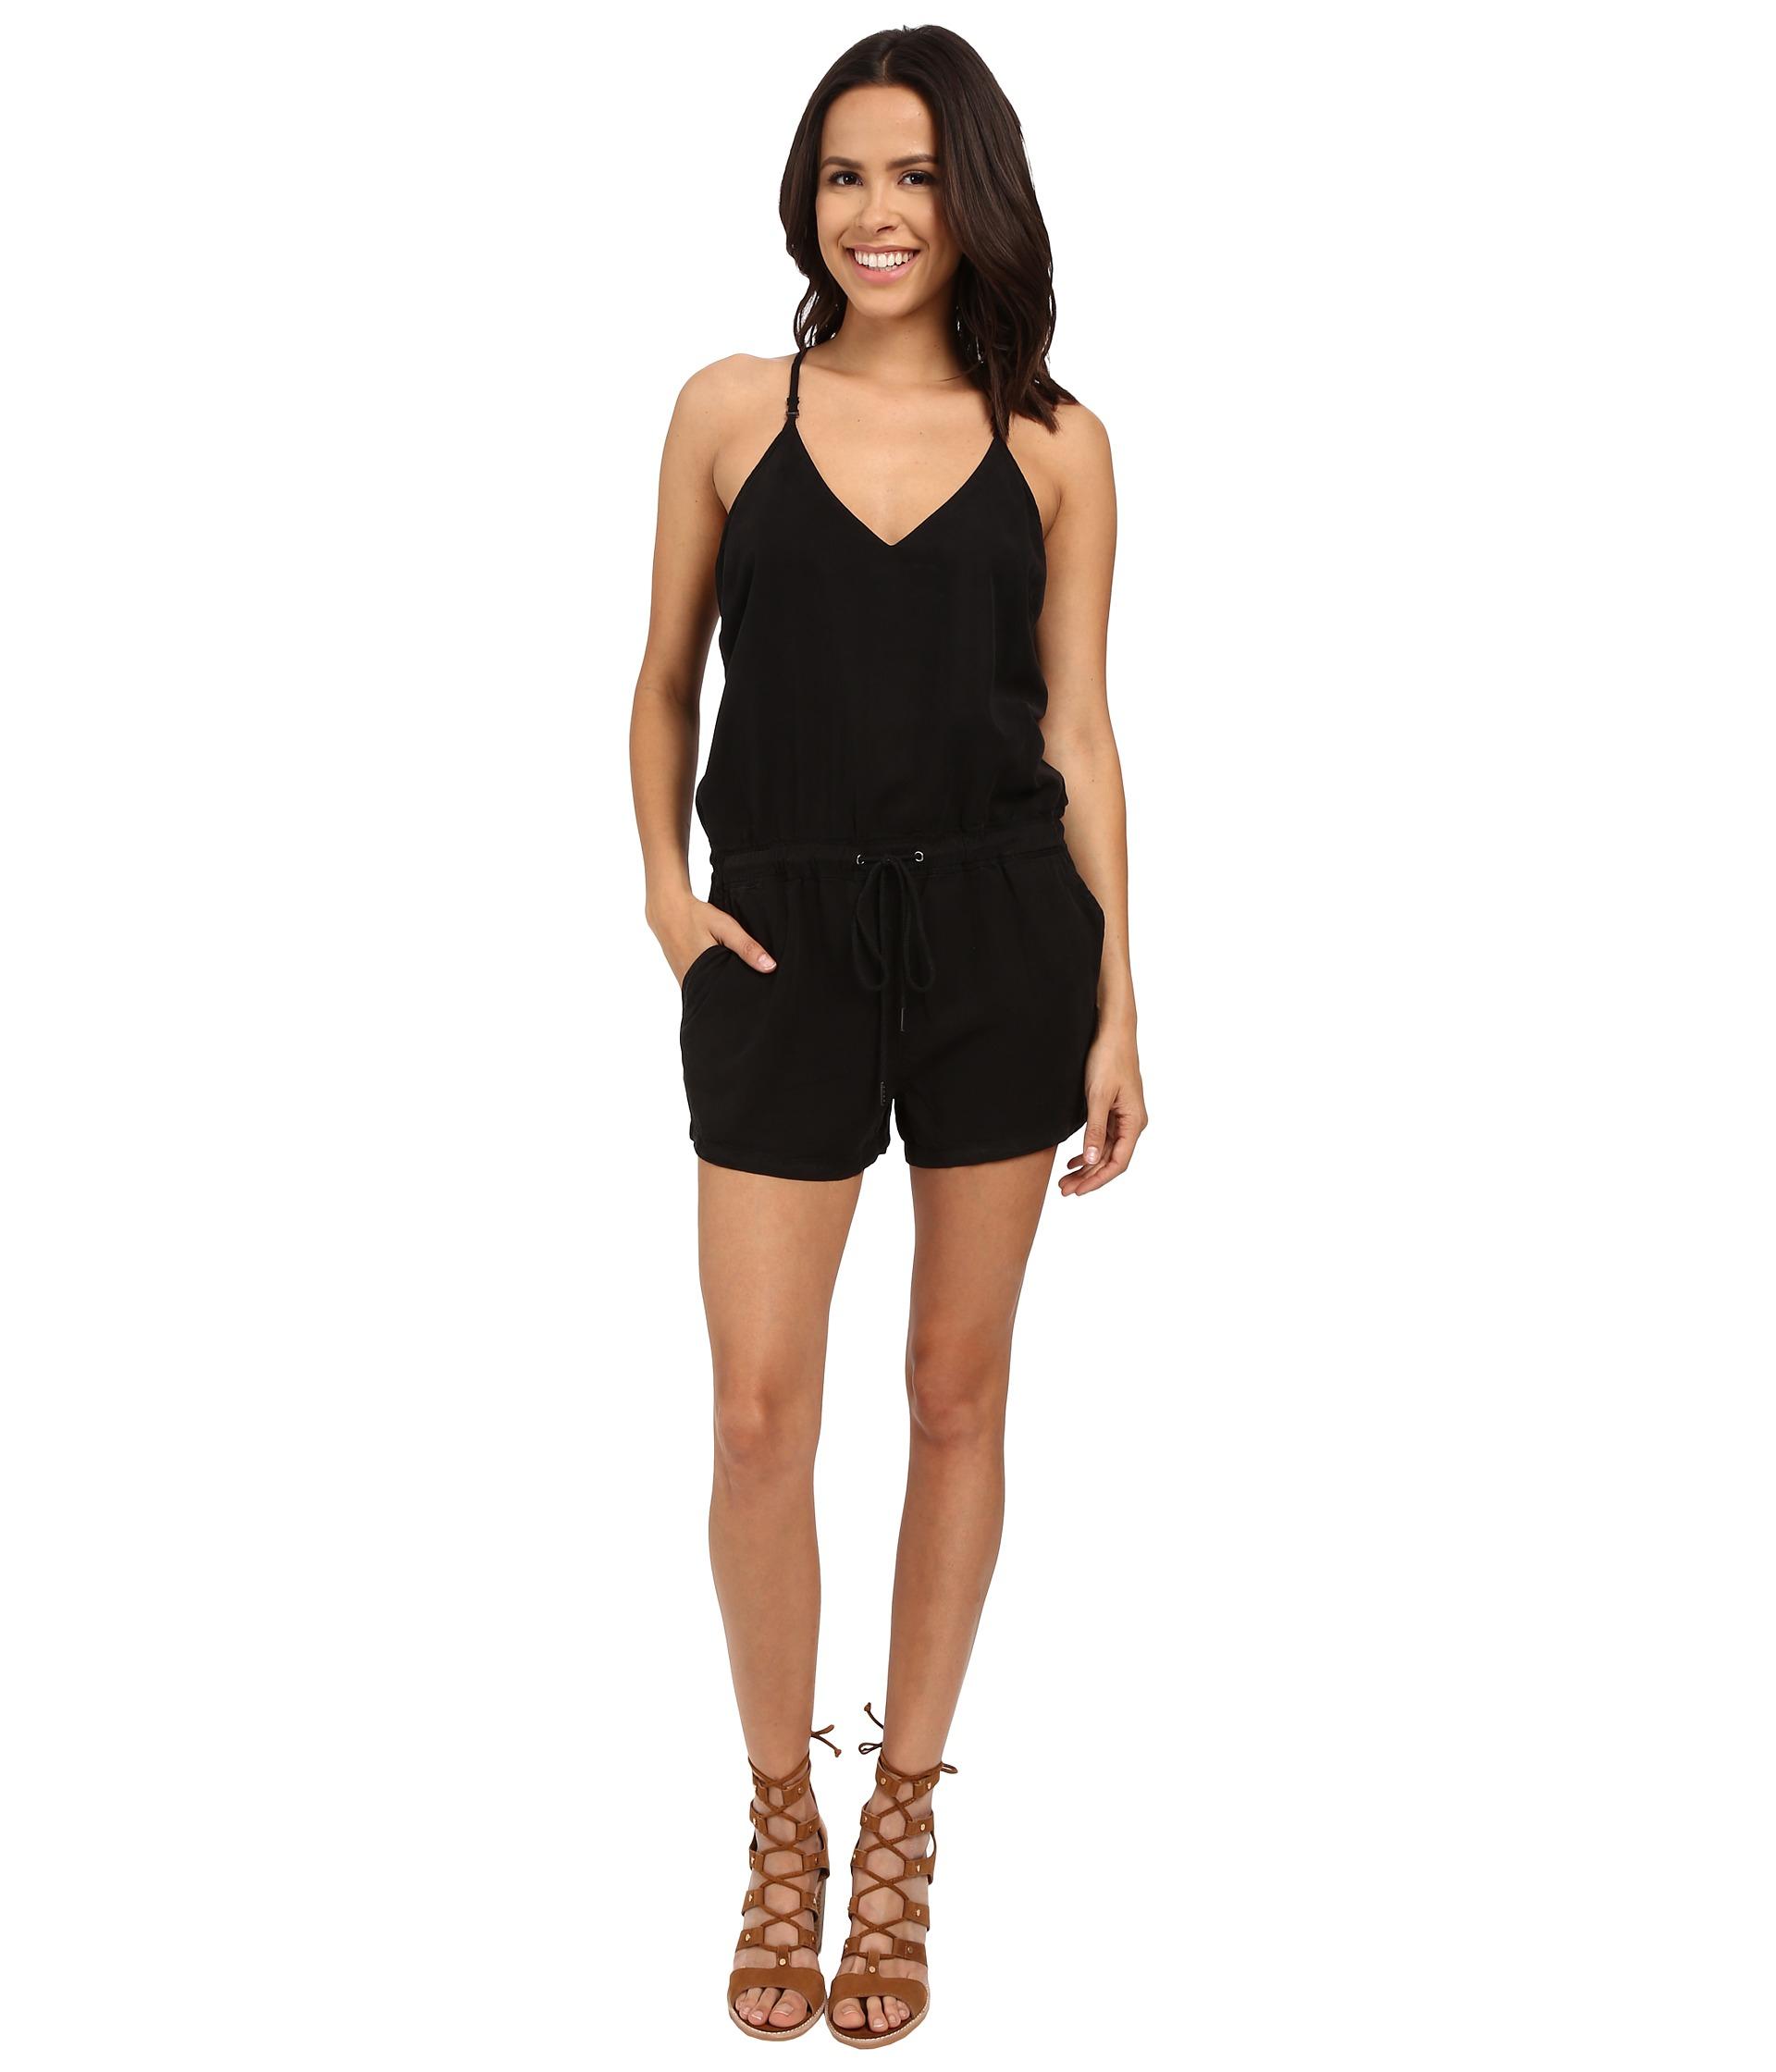 Lyst - Blank Short Romper in Black